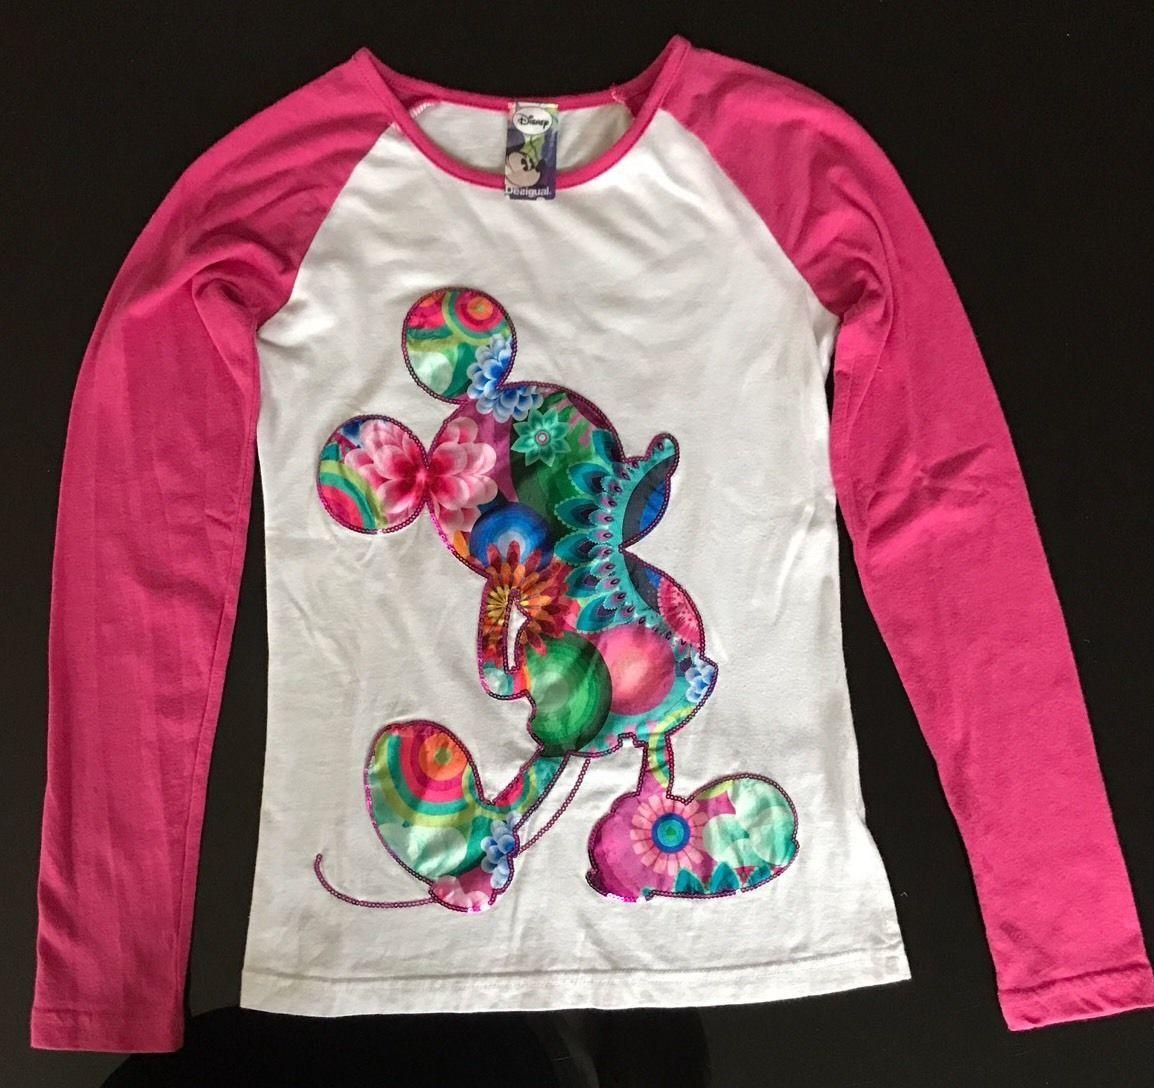 Desigual Shirt Micky Maus in Kleidung & Accessoires, Kindermode, Schuhe & Access., Mode für Mädchen   eBay!